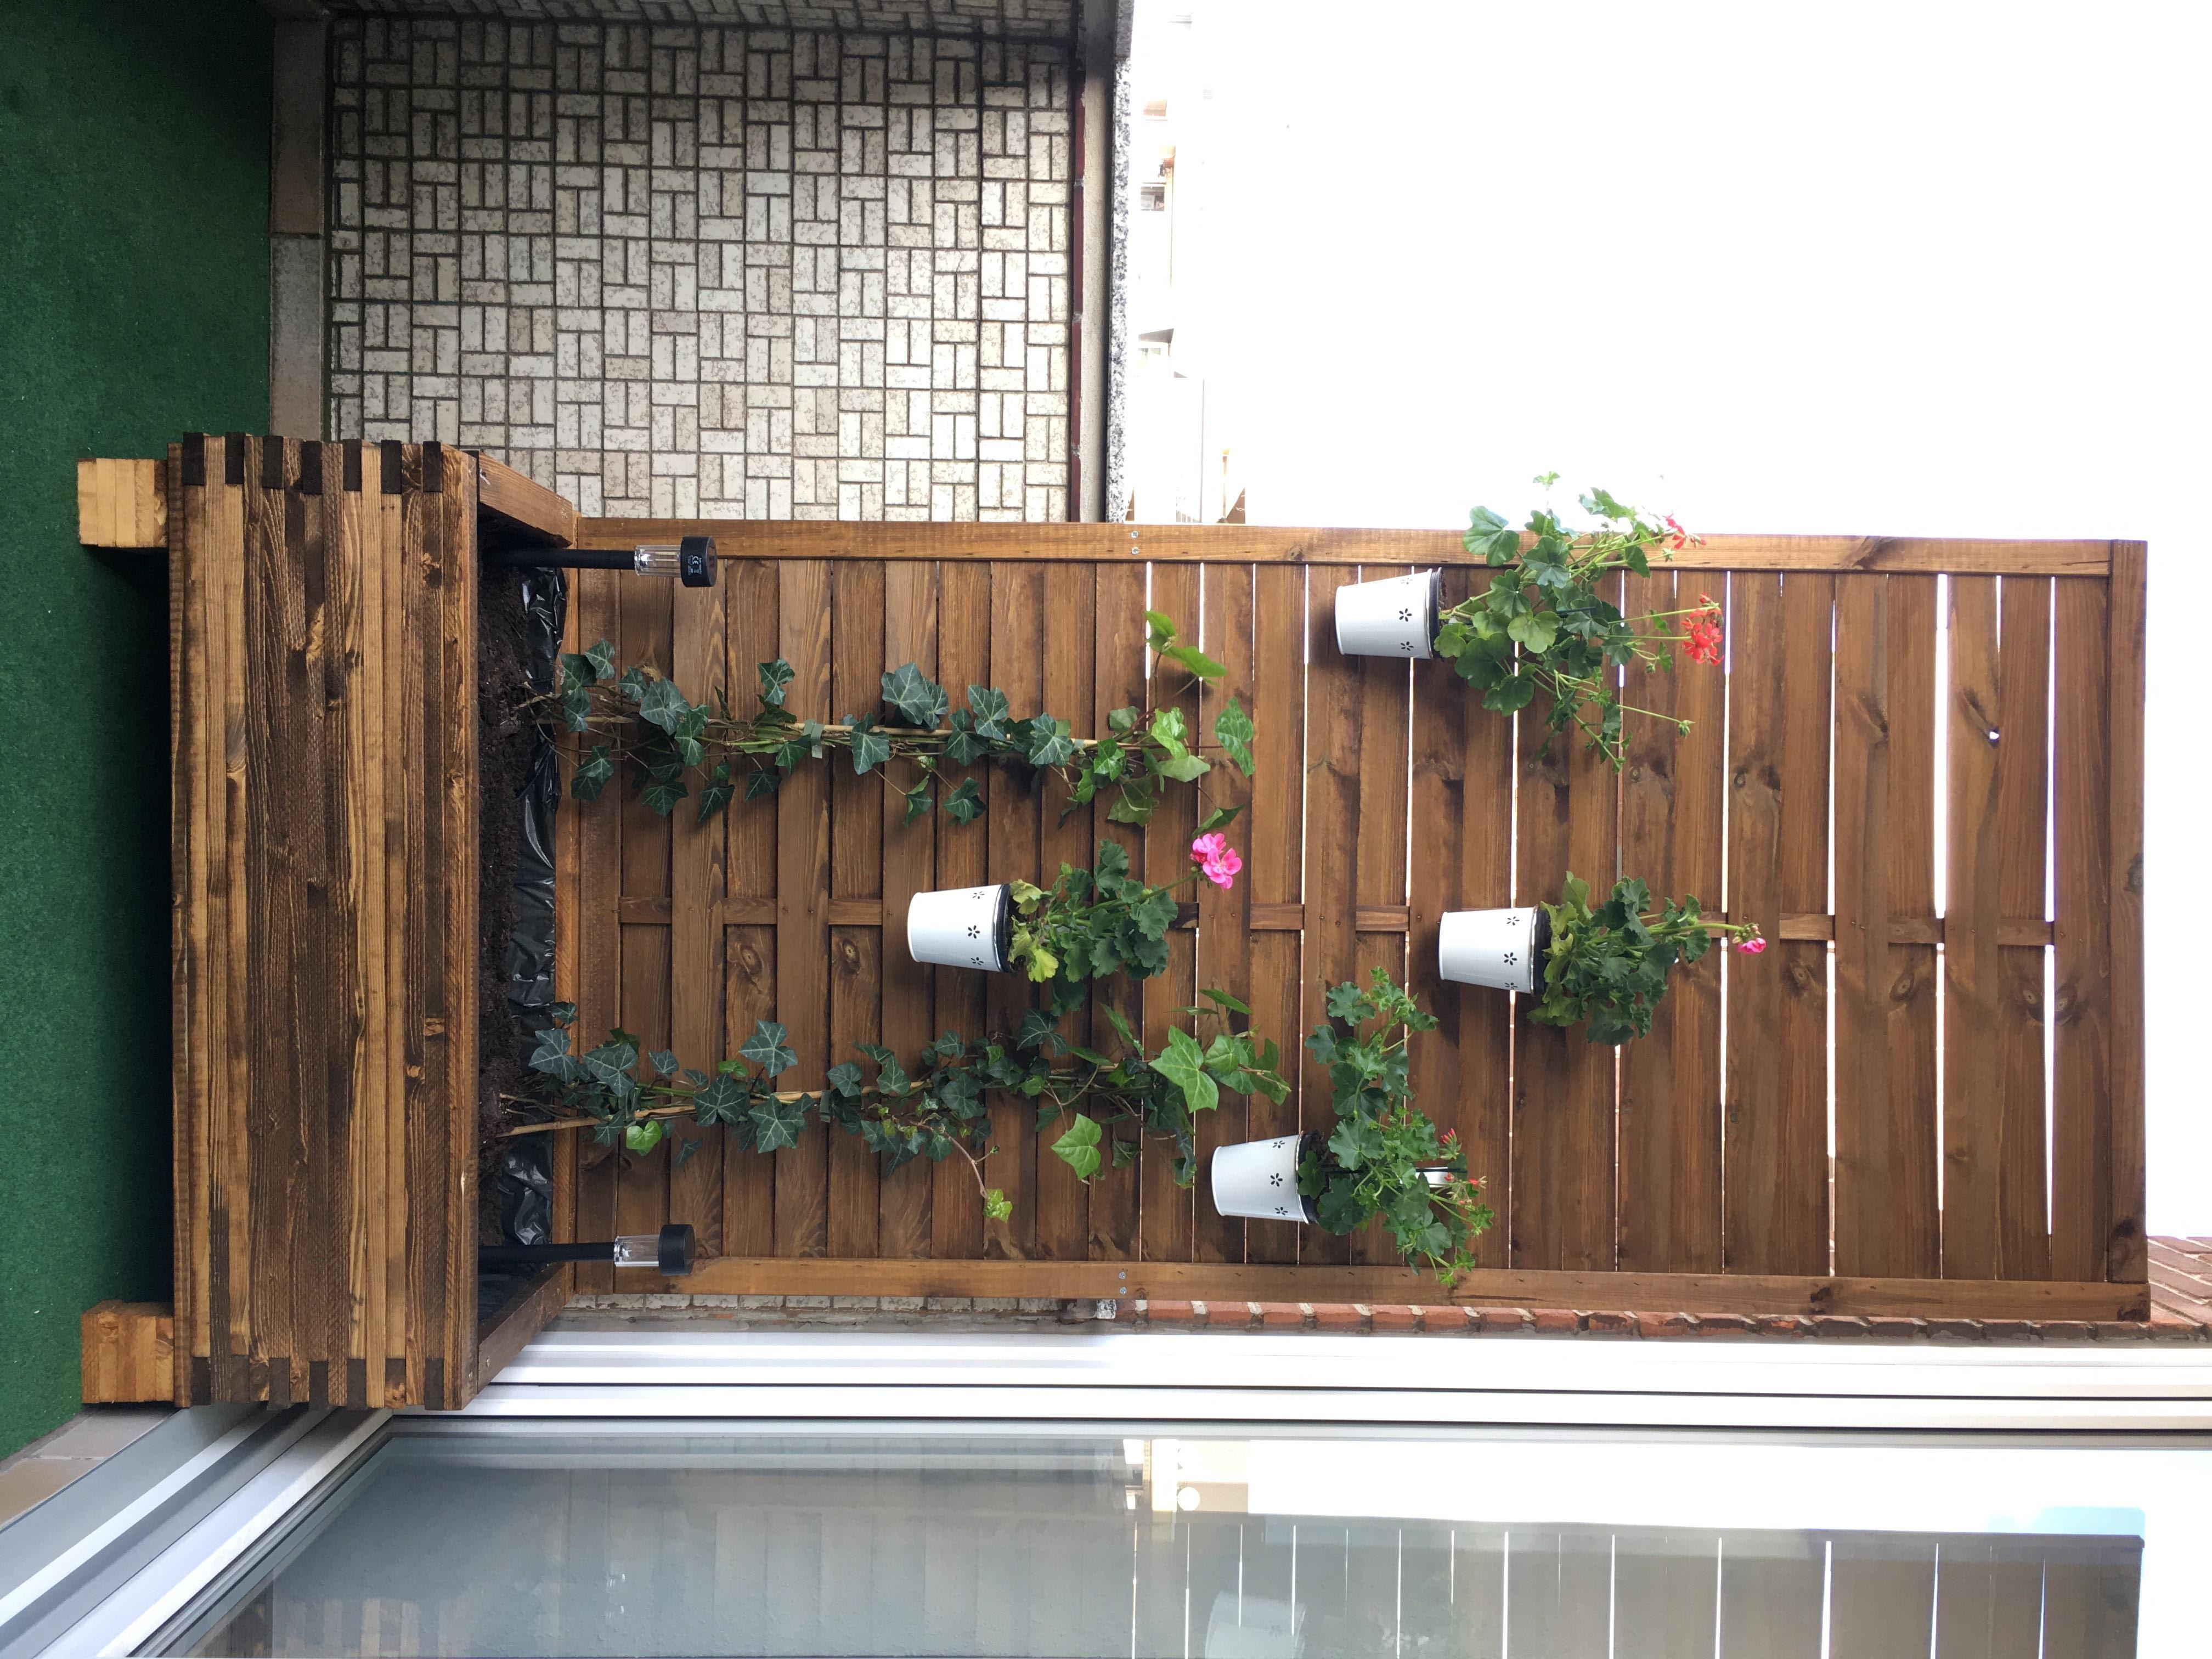 Balkon Sichtschutz Blumenkübel DIY Anleitung – idatschka.de